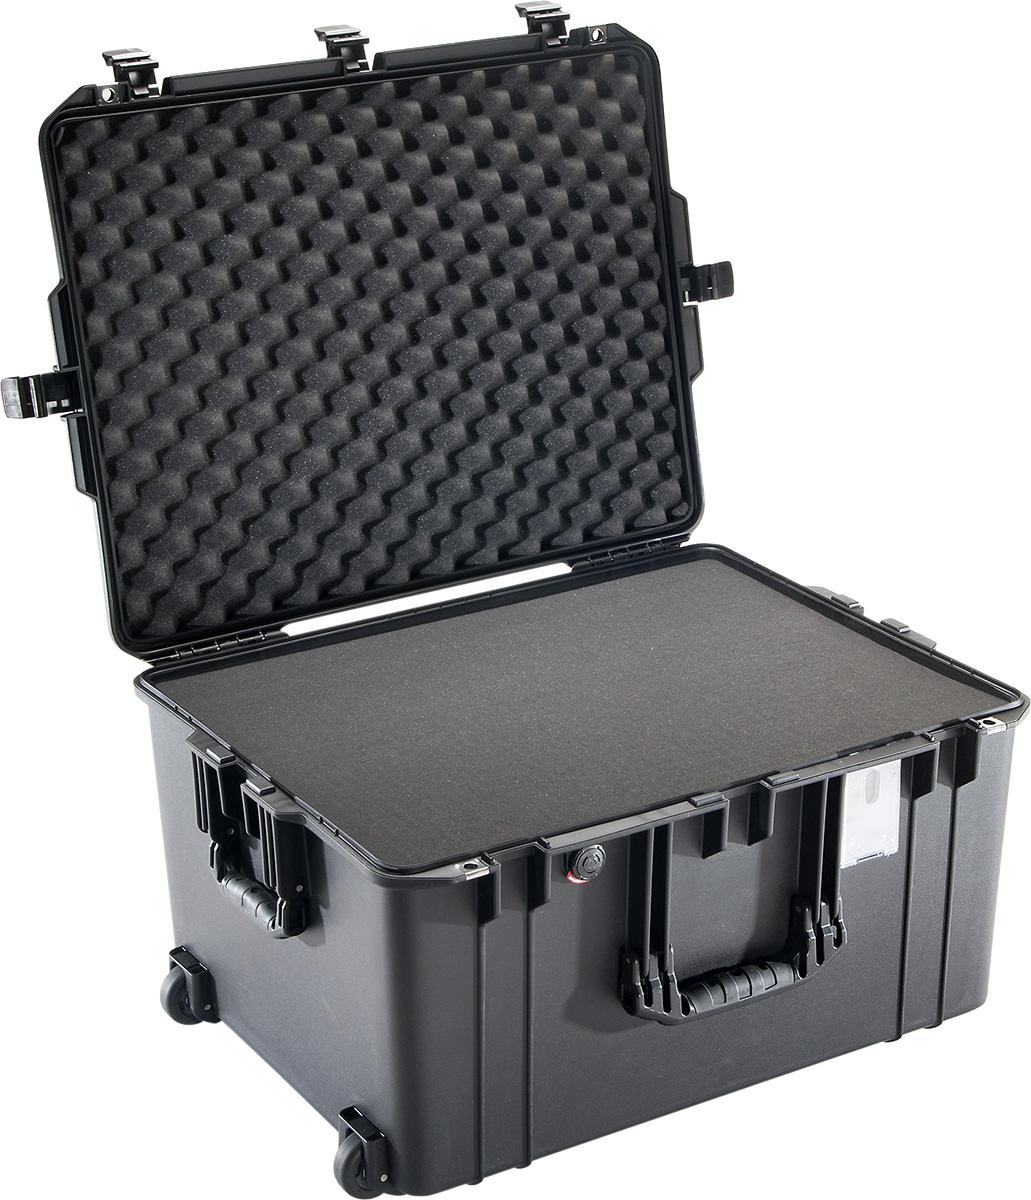 pelican 1637 air case deep travel cases